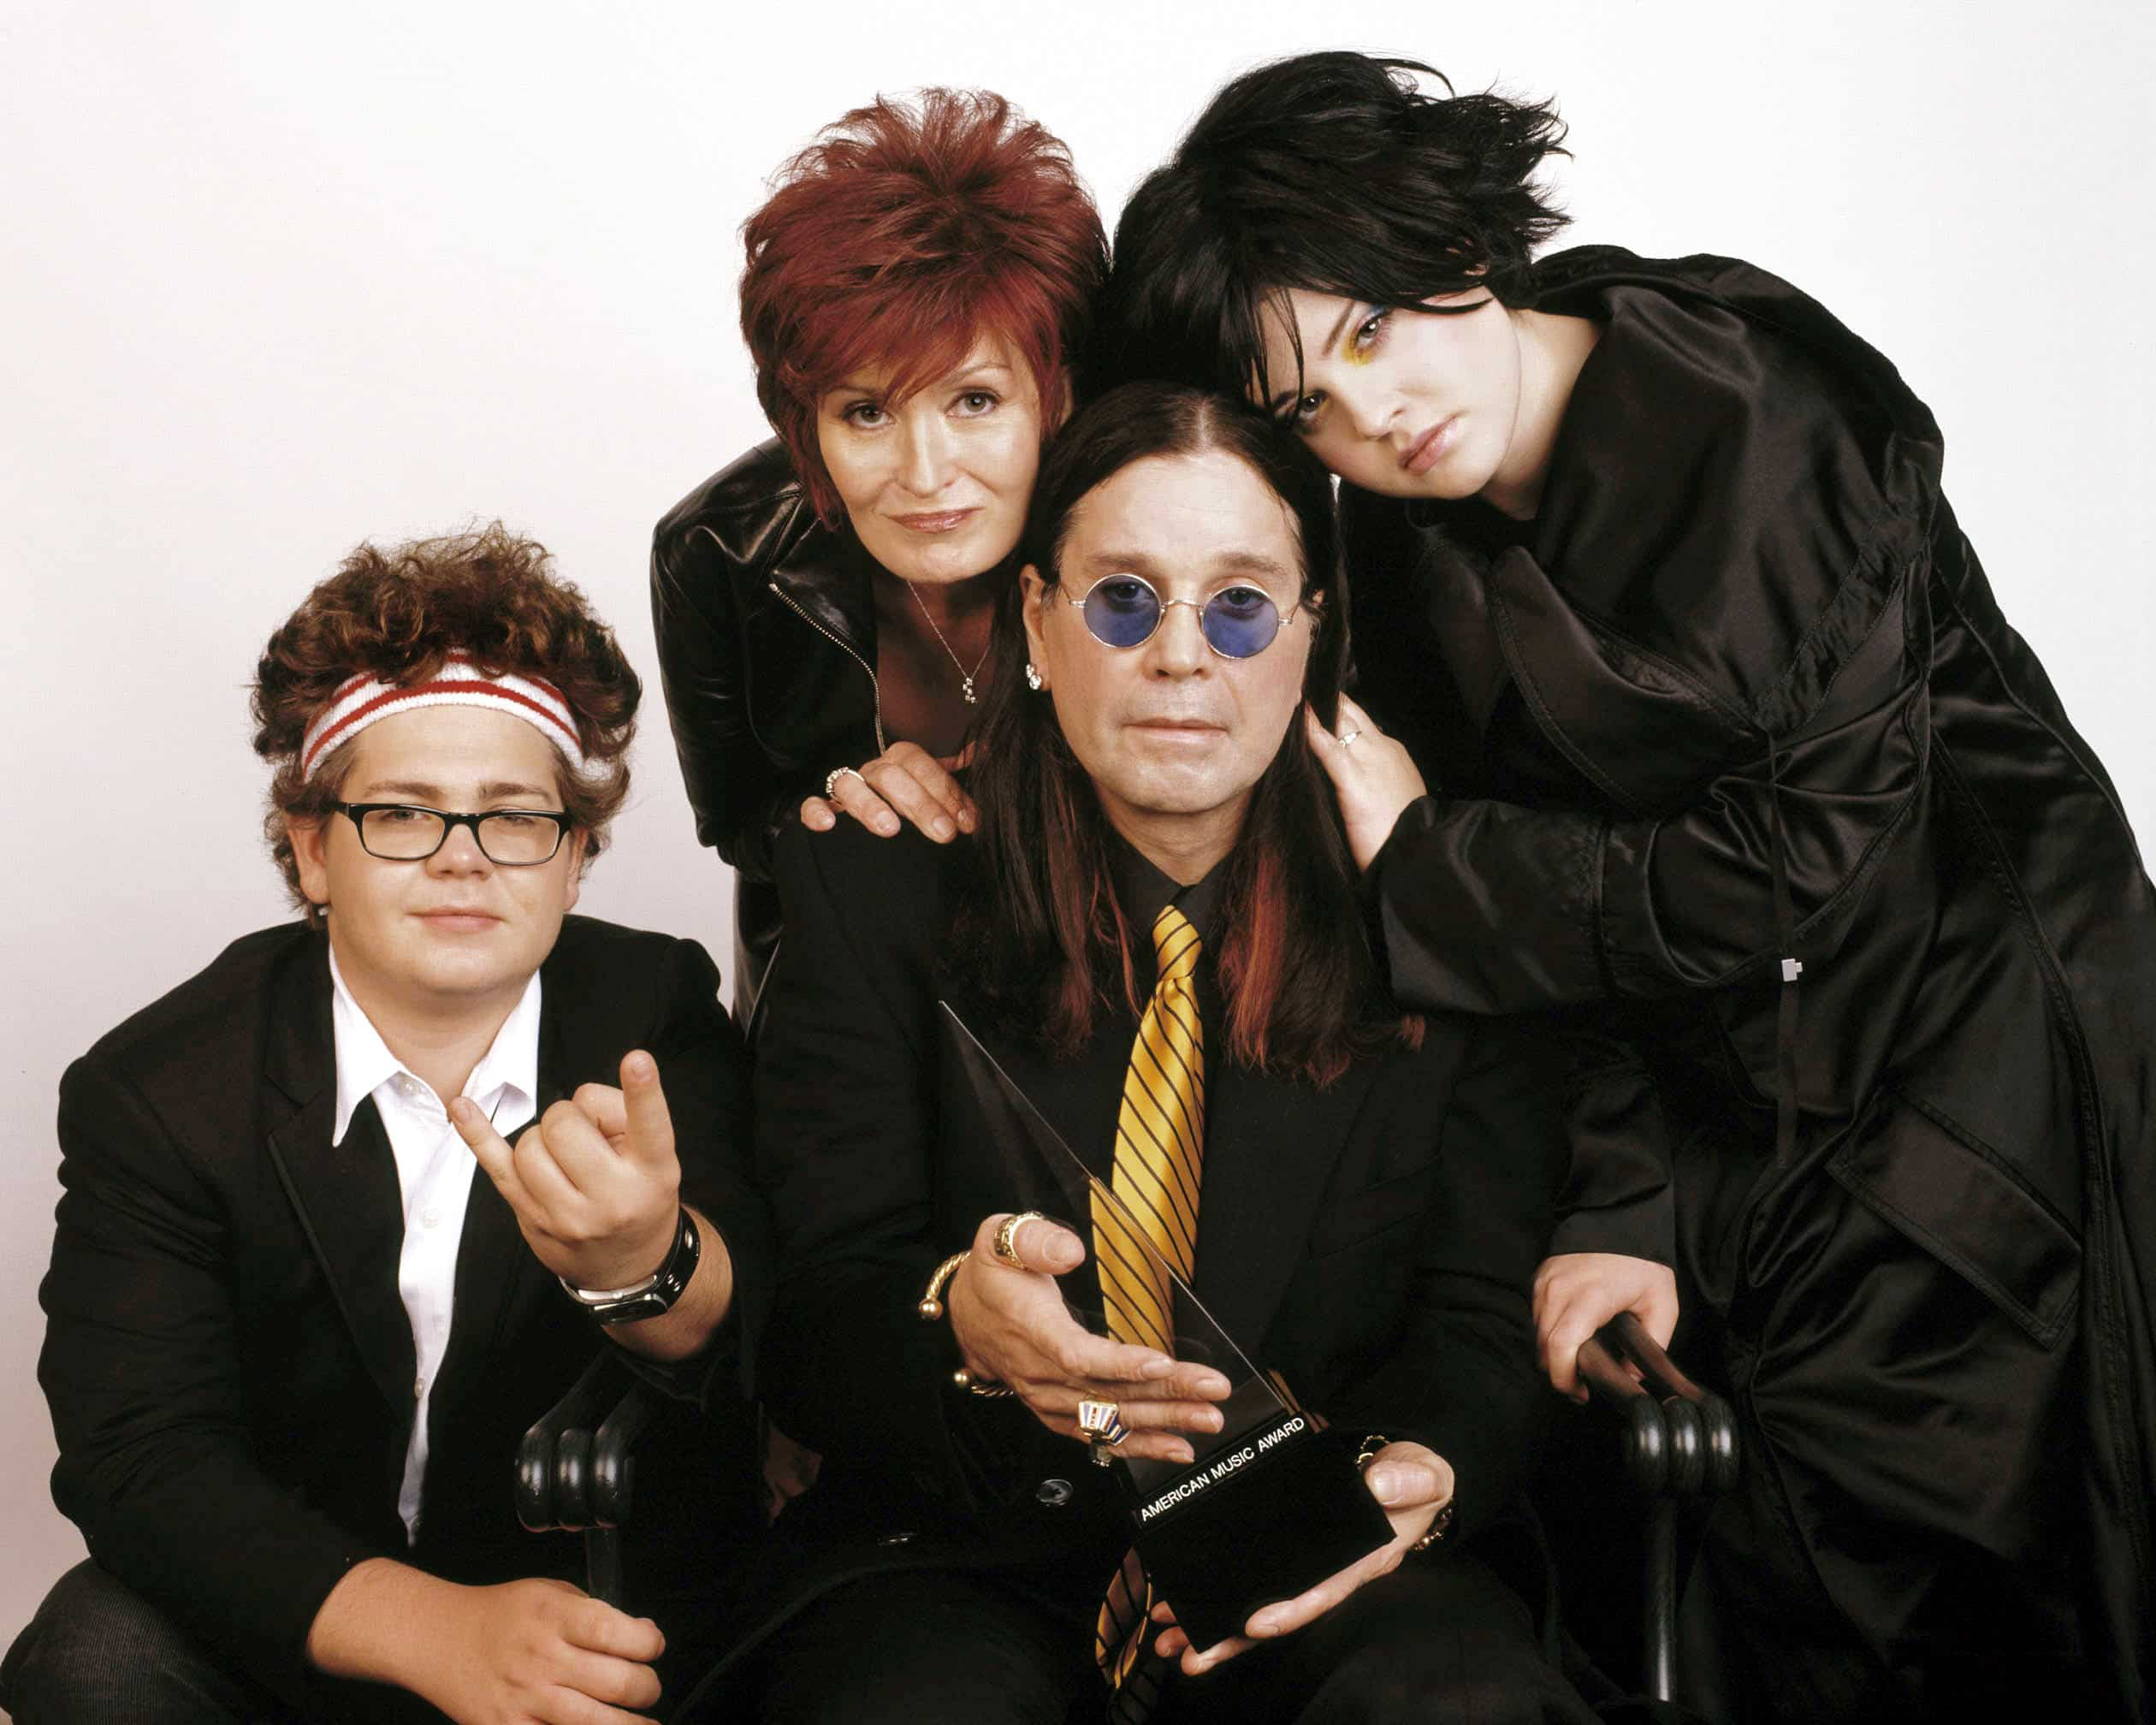 AMERICAN MUSIC AWARDS 2003, Hosted by The Osbournes (Jack Osbourne, Sharon Osbourne, Ozzy Osbourne, Kelly Osbourne)